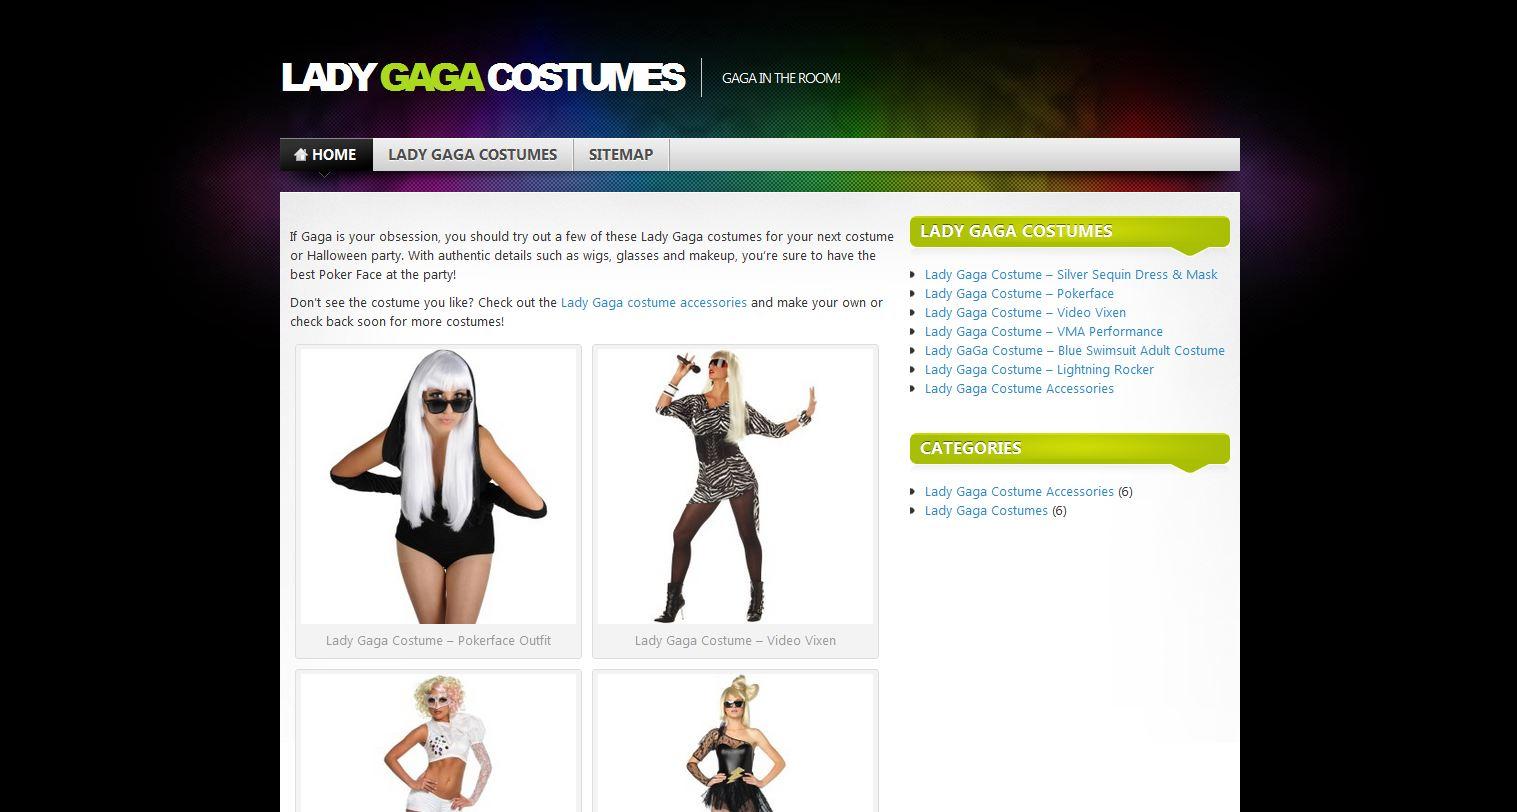 Website Launch: Shop Lady Gaga Costumes